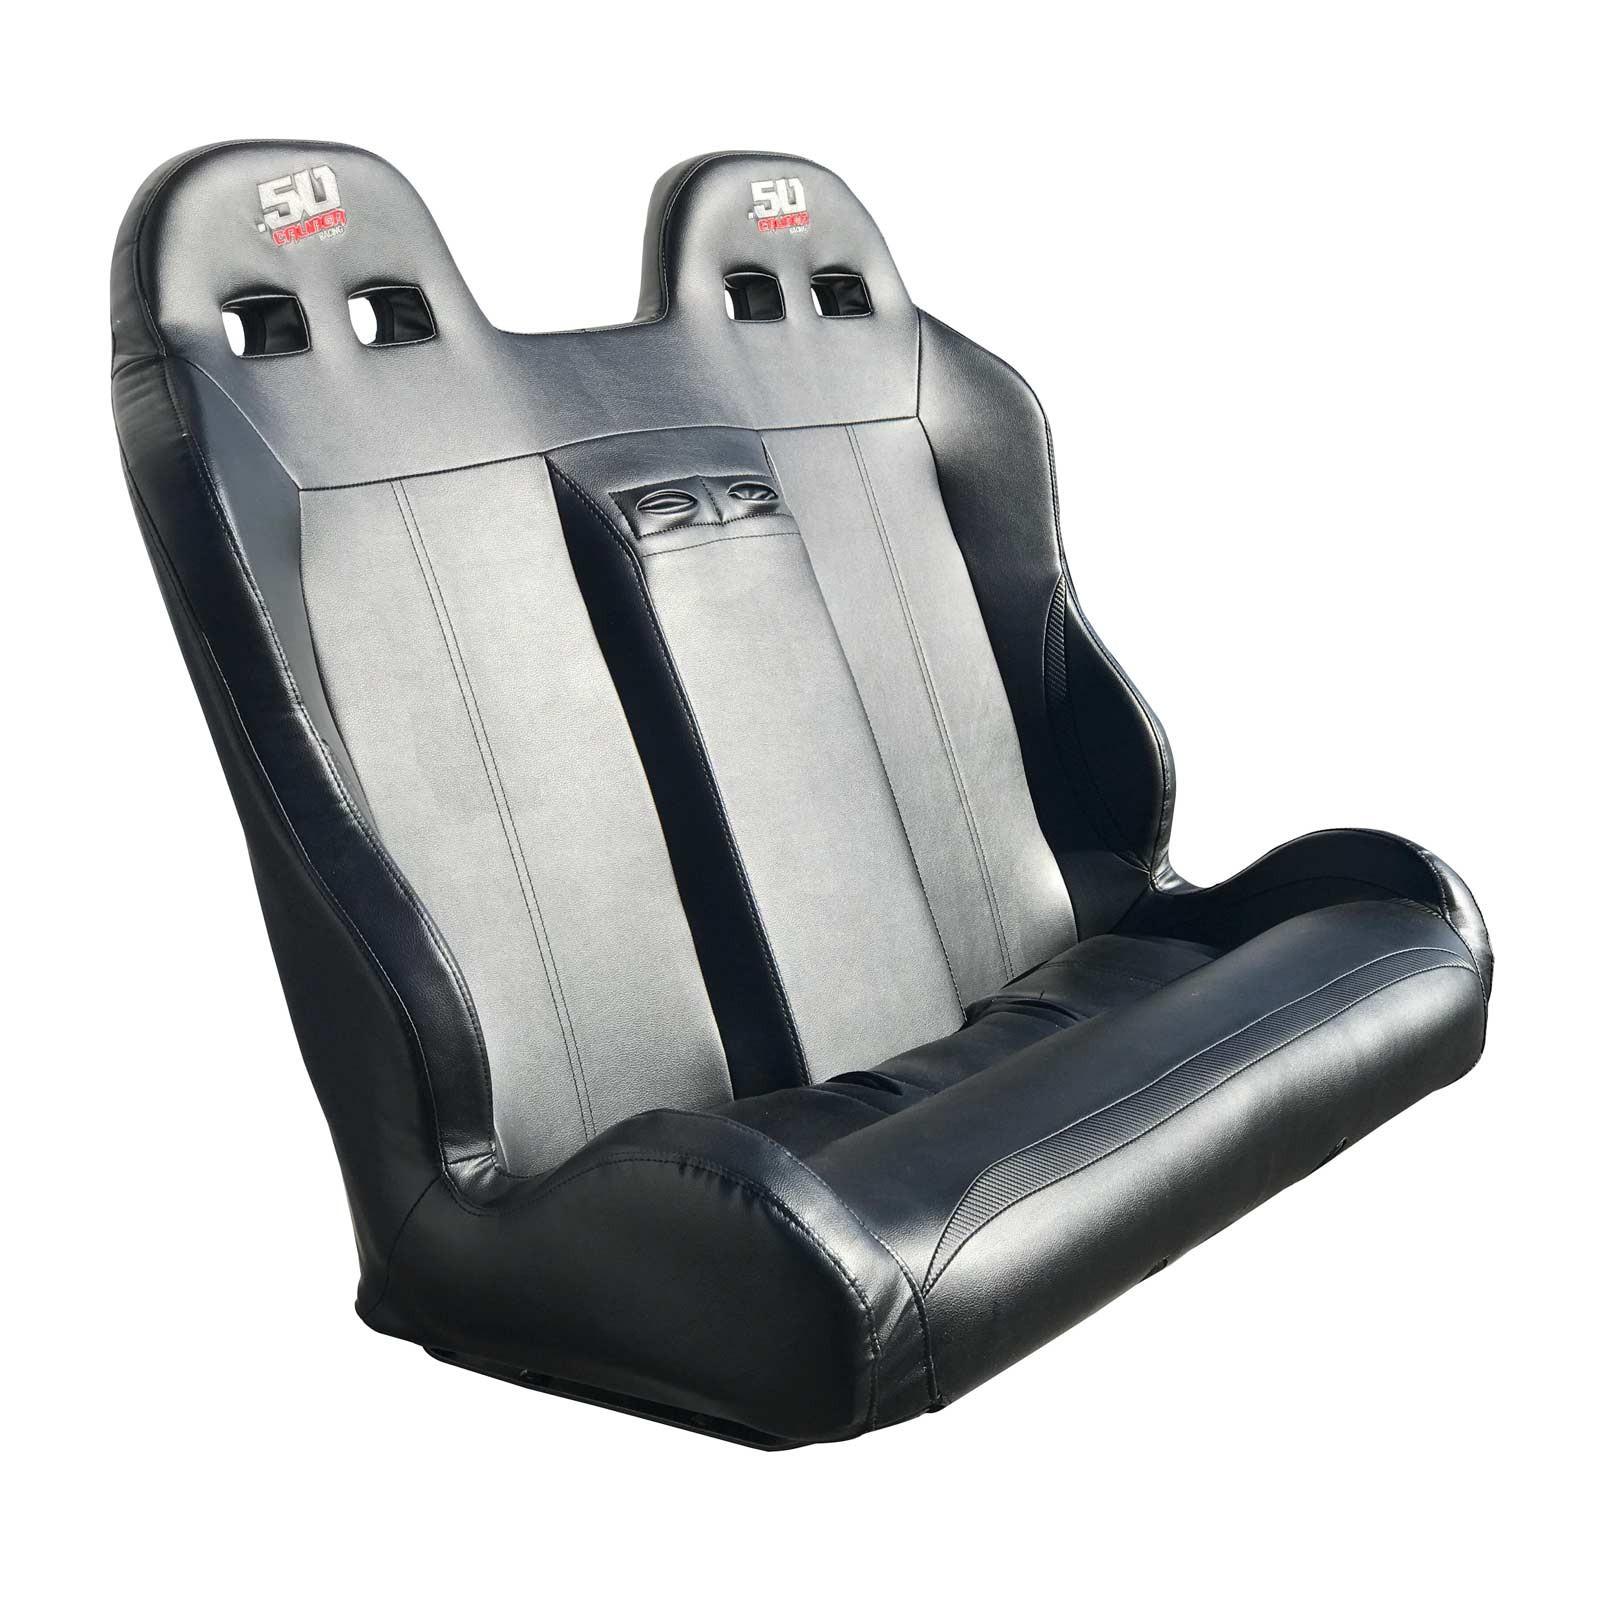 Rear Bench Seat Carbon Fiber Polaris Rzr Xp1000 Turbo S 900 S 1000